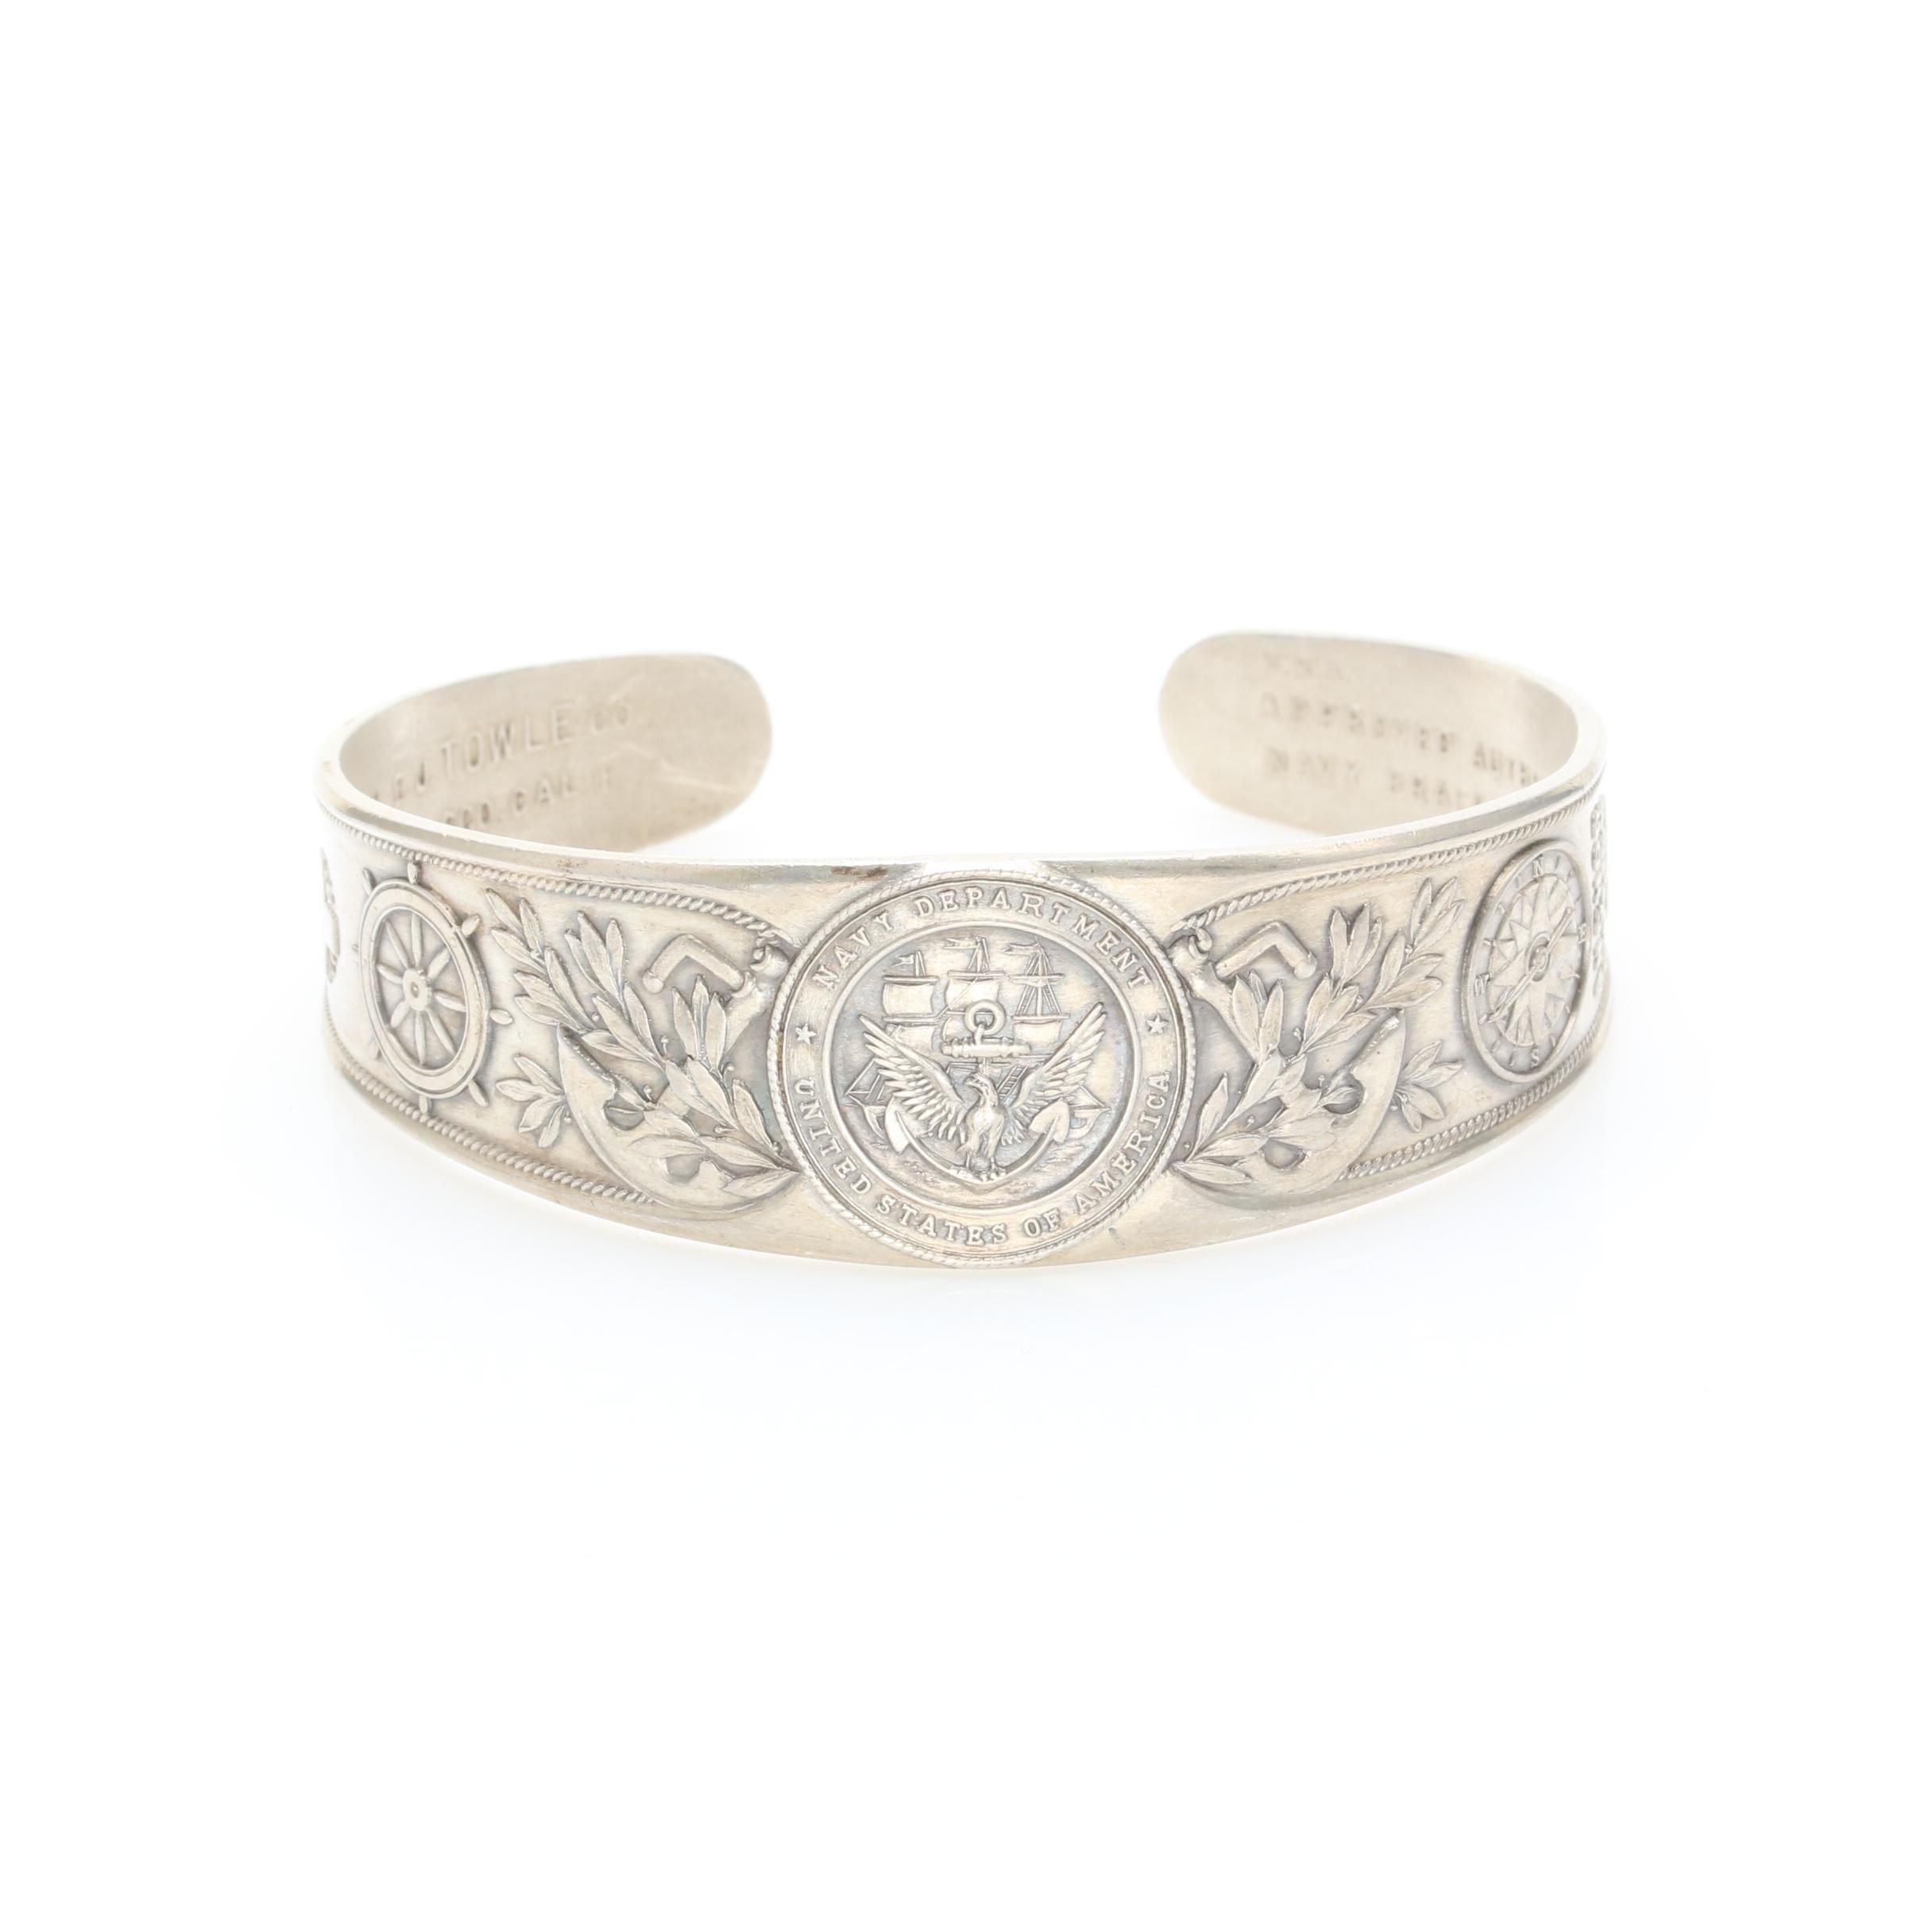 Sterling Silver Navy Department Cuff Bracelet